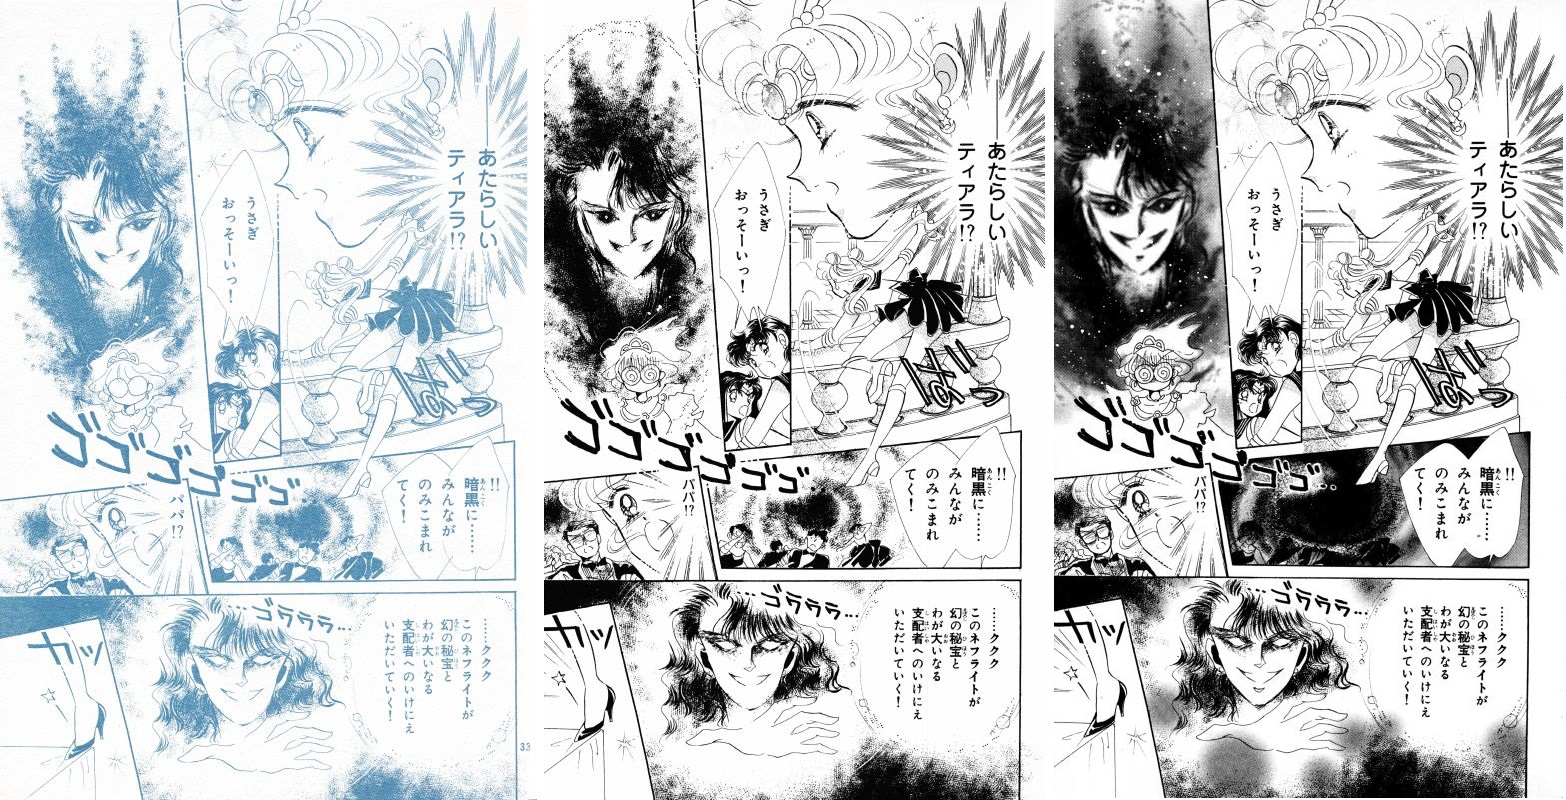 Act 4, Page 30 – Nakayoshi, Original, Remaster